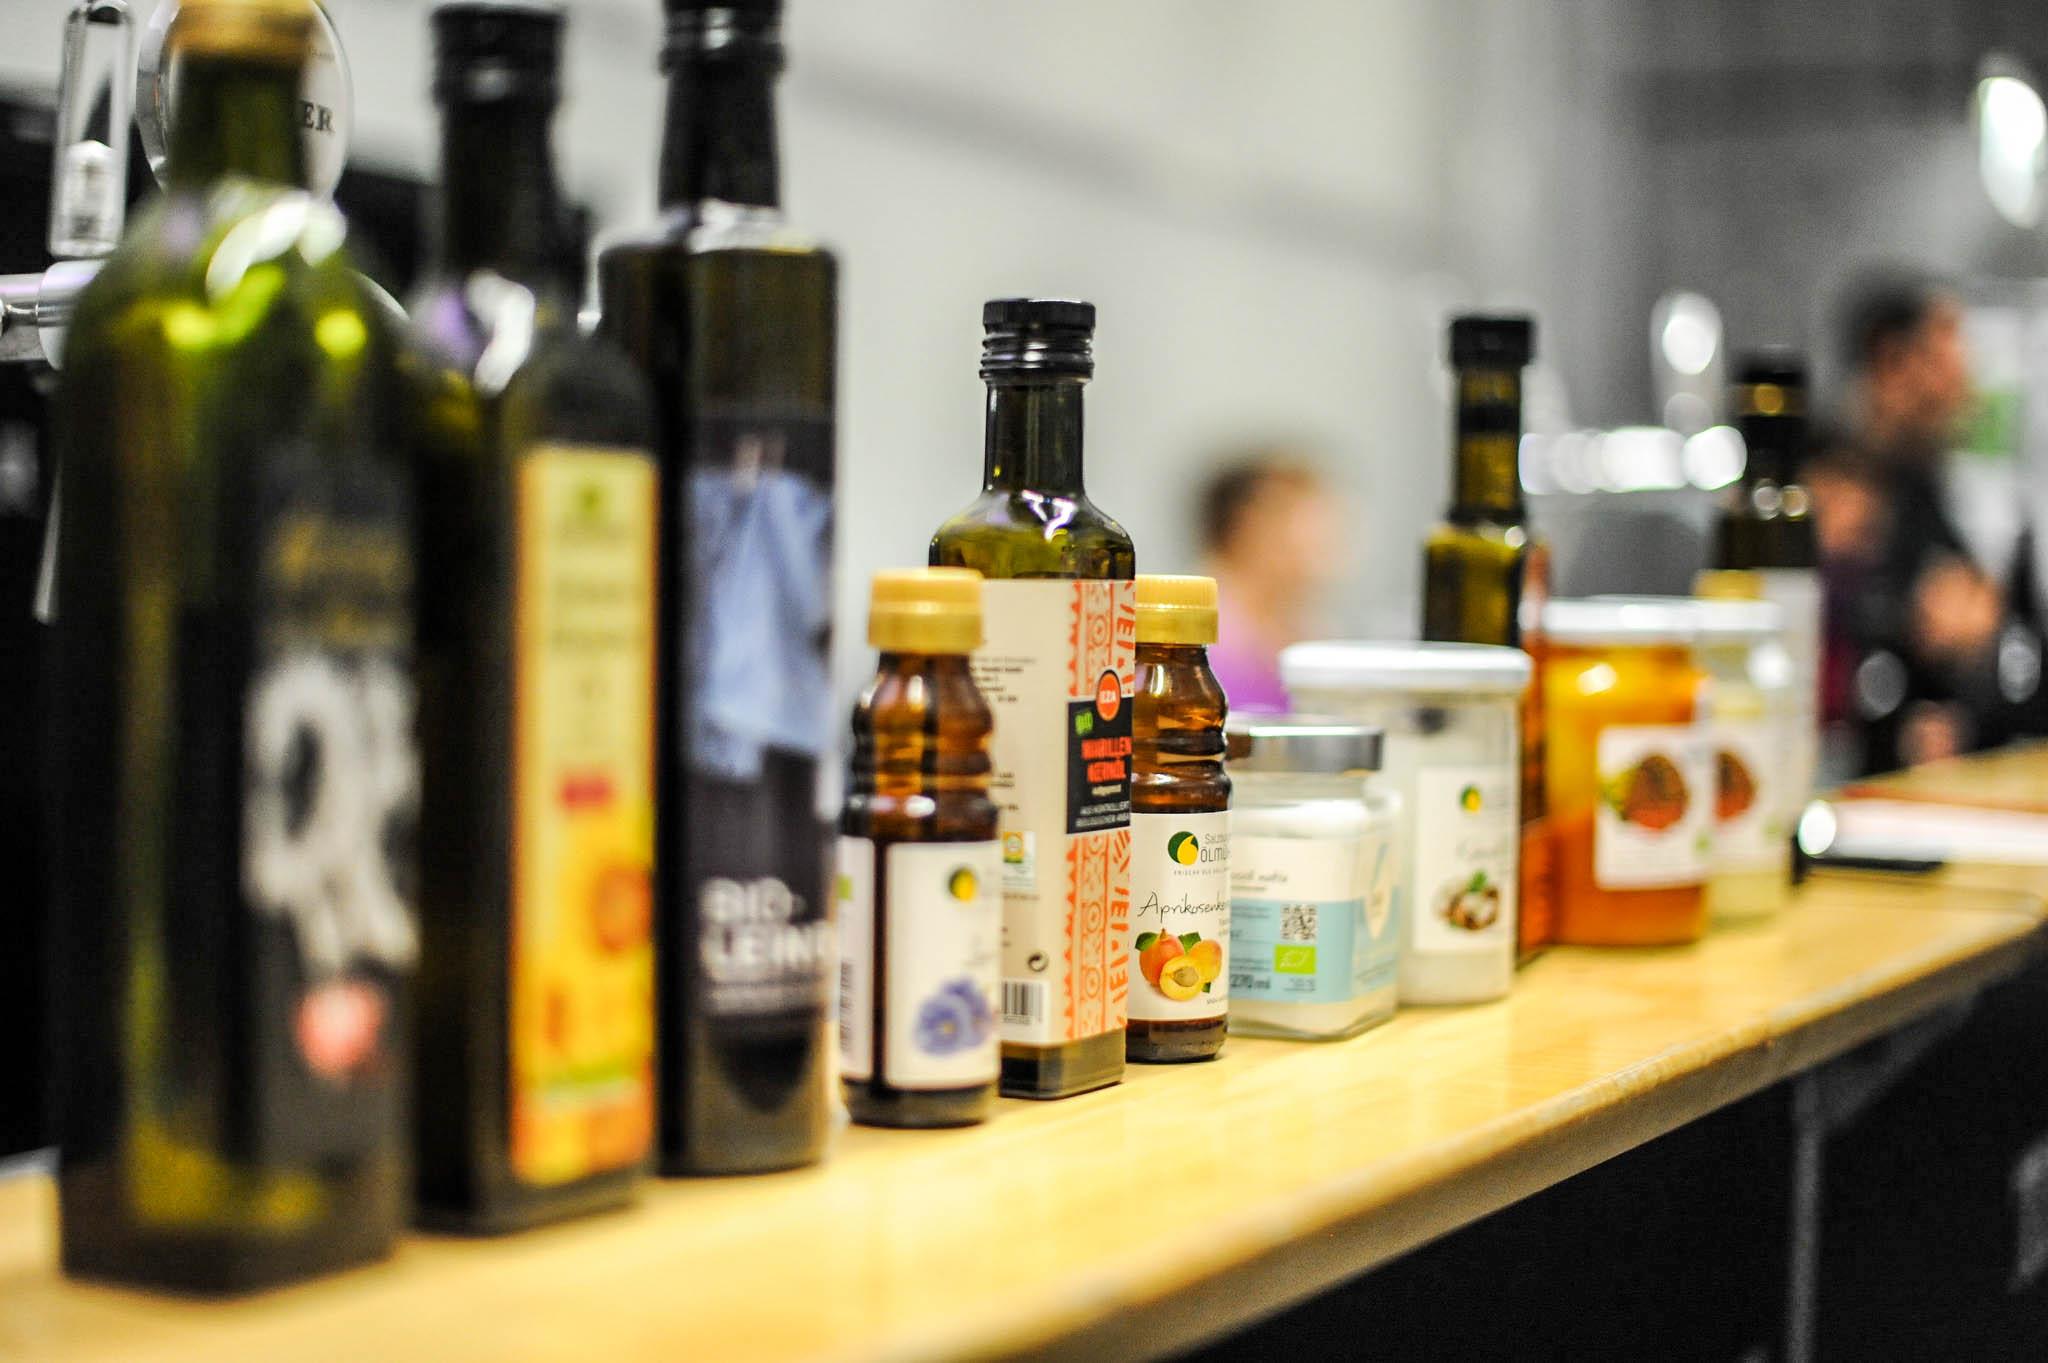 Tasting_forum Verkostung Bio 3.0 Bio-Öl Palmöl Salzburg